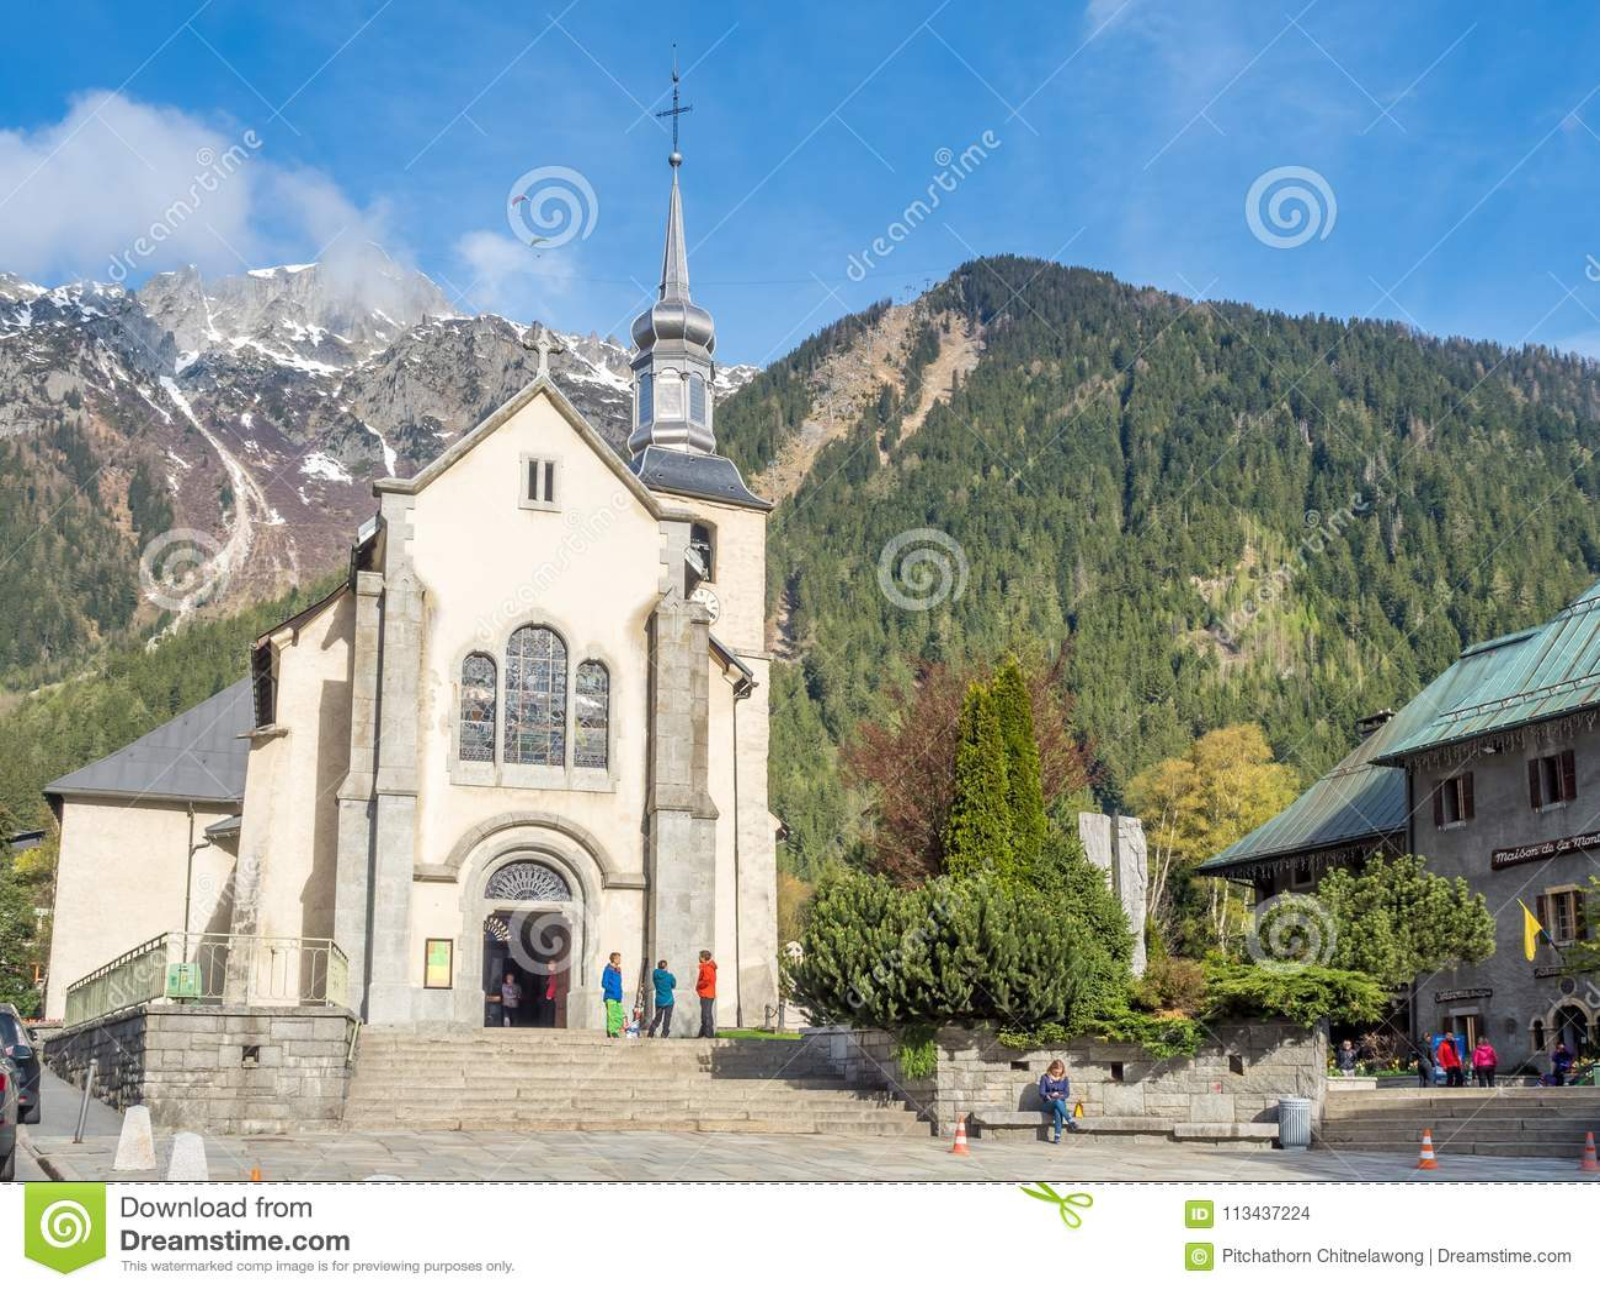 Très bien Paroisse Saint Bernard Church In Chamonix, France Editorial Stock @VU_48